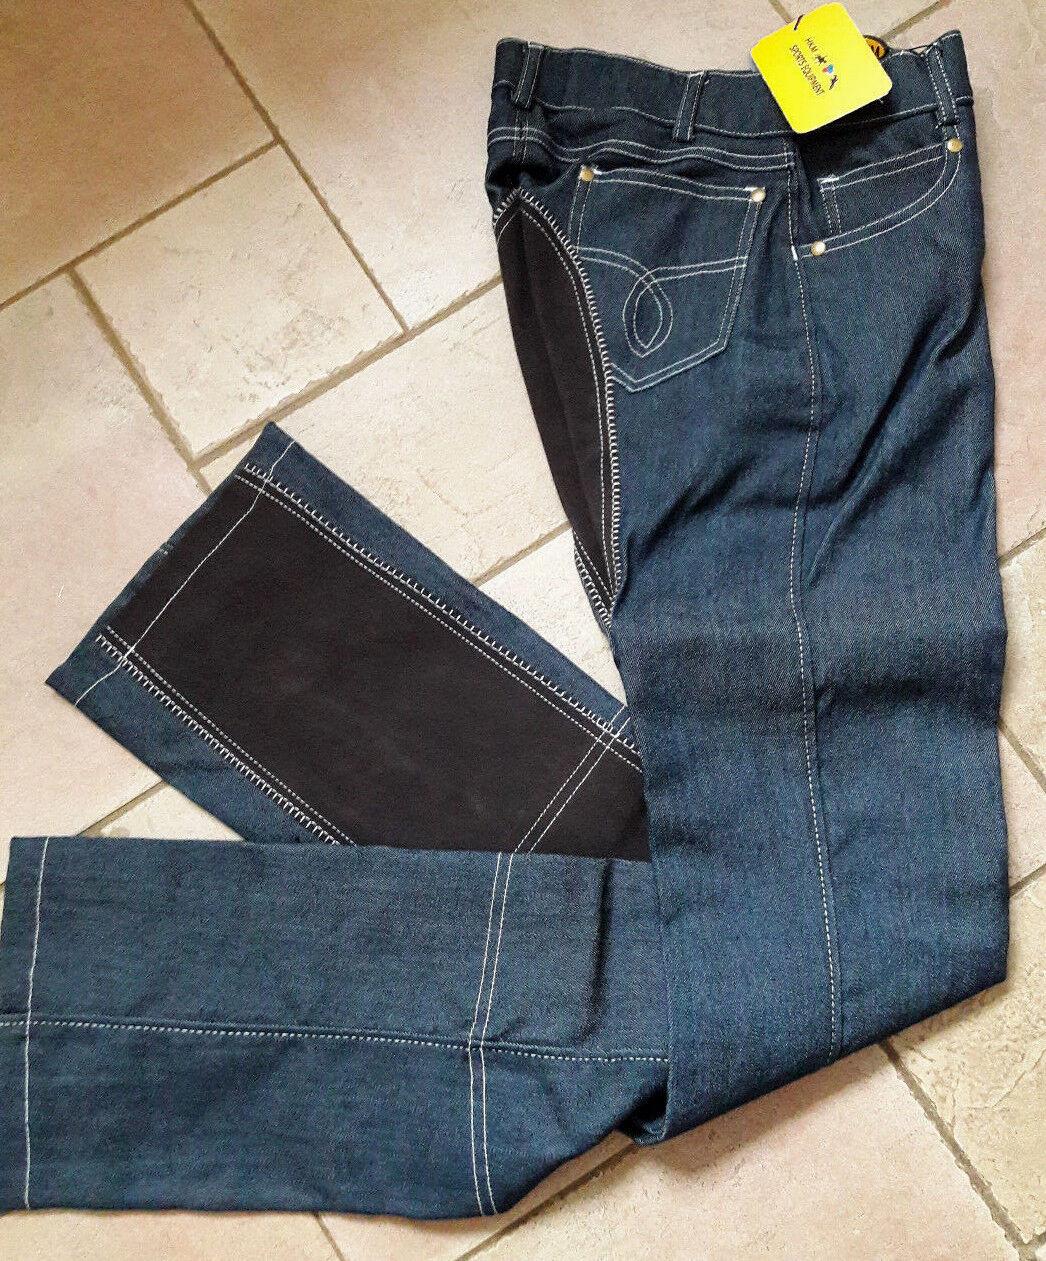 HKM Damen Jeans Jodhpur Vollbesatz Reithose Gr. 34 - 54 New Western